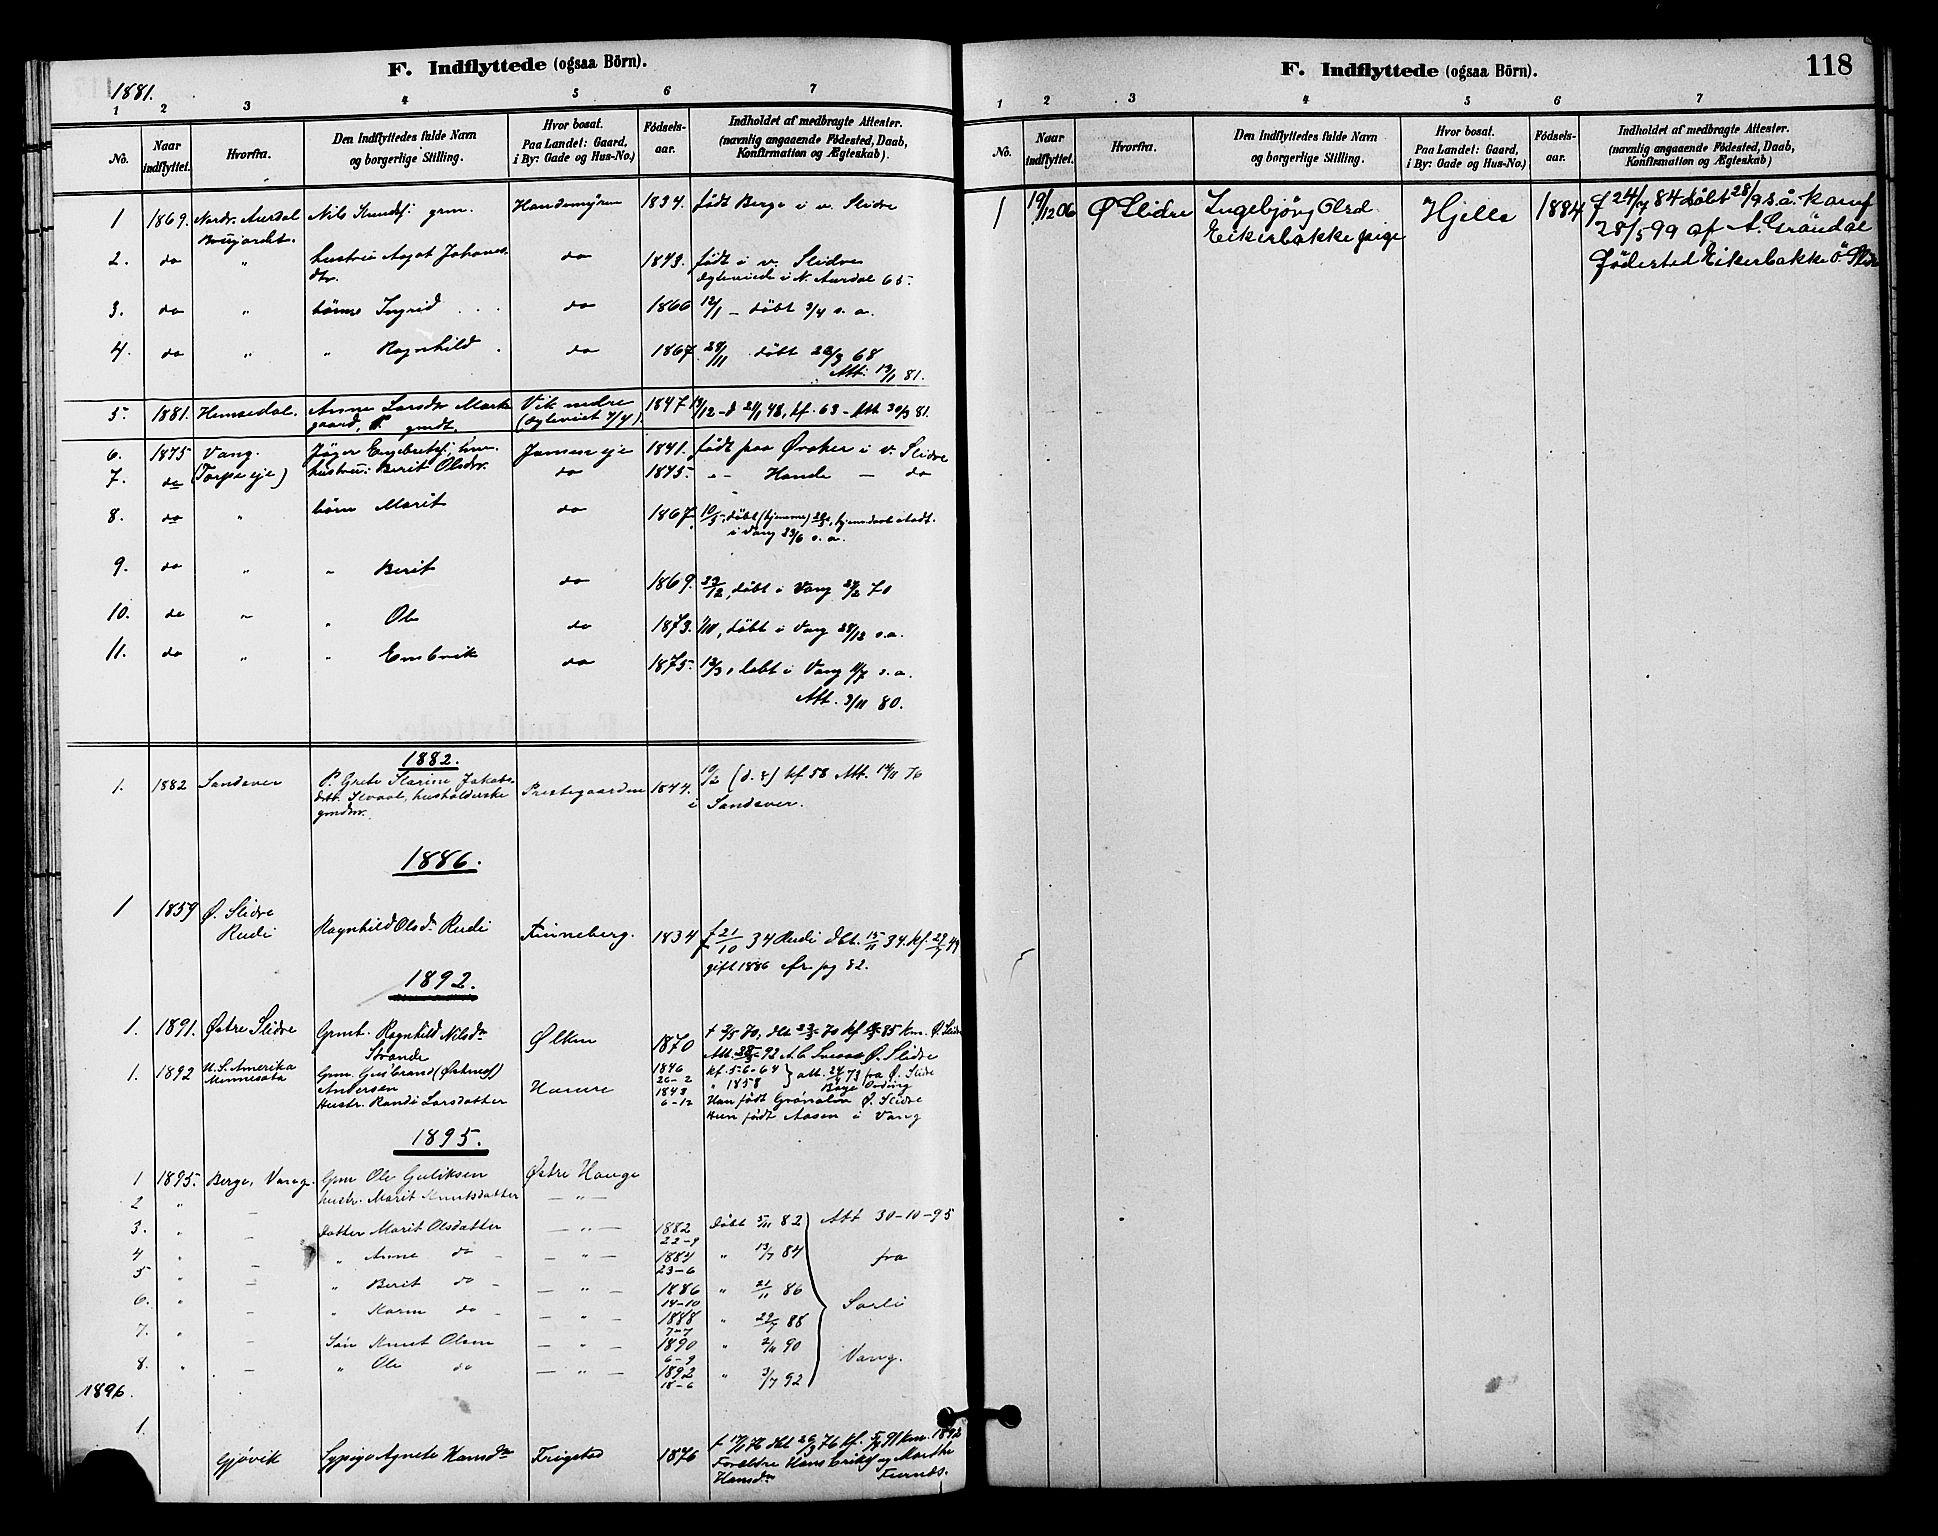 SAH, Vestre Slidre prestekontor, Klokkerbok nr. 4, 1881-1912, s. 118